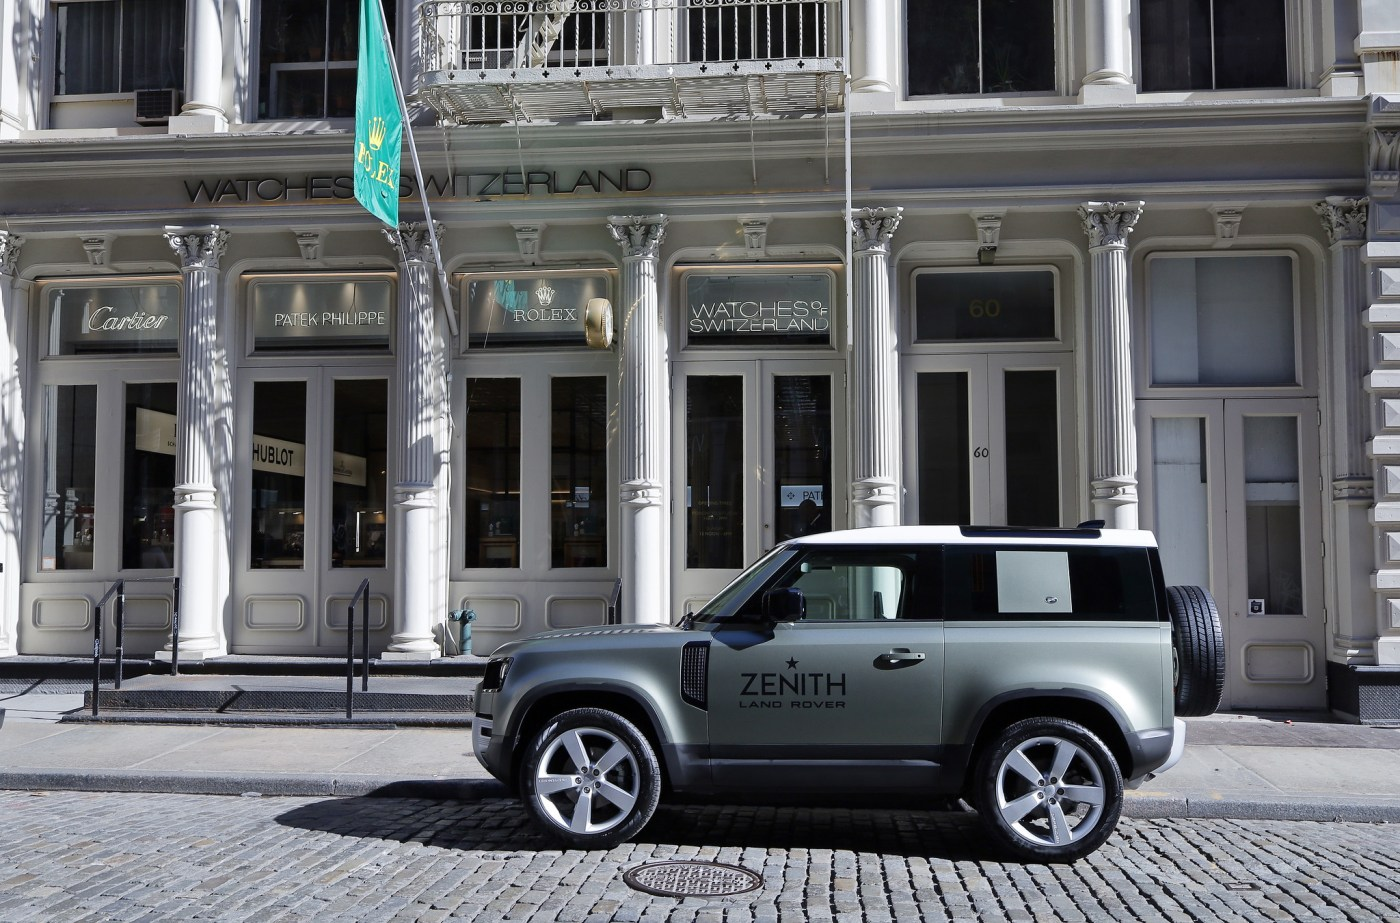 Watches of Switzerland SoHo Land Rover Zenith debut 2020